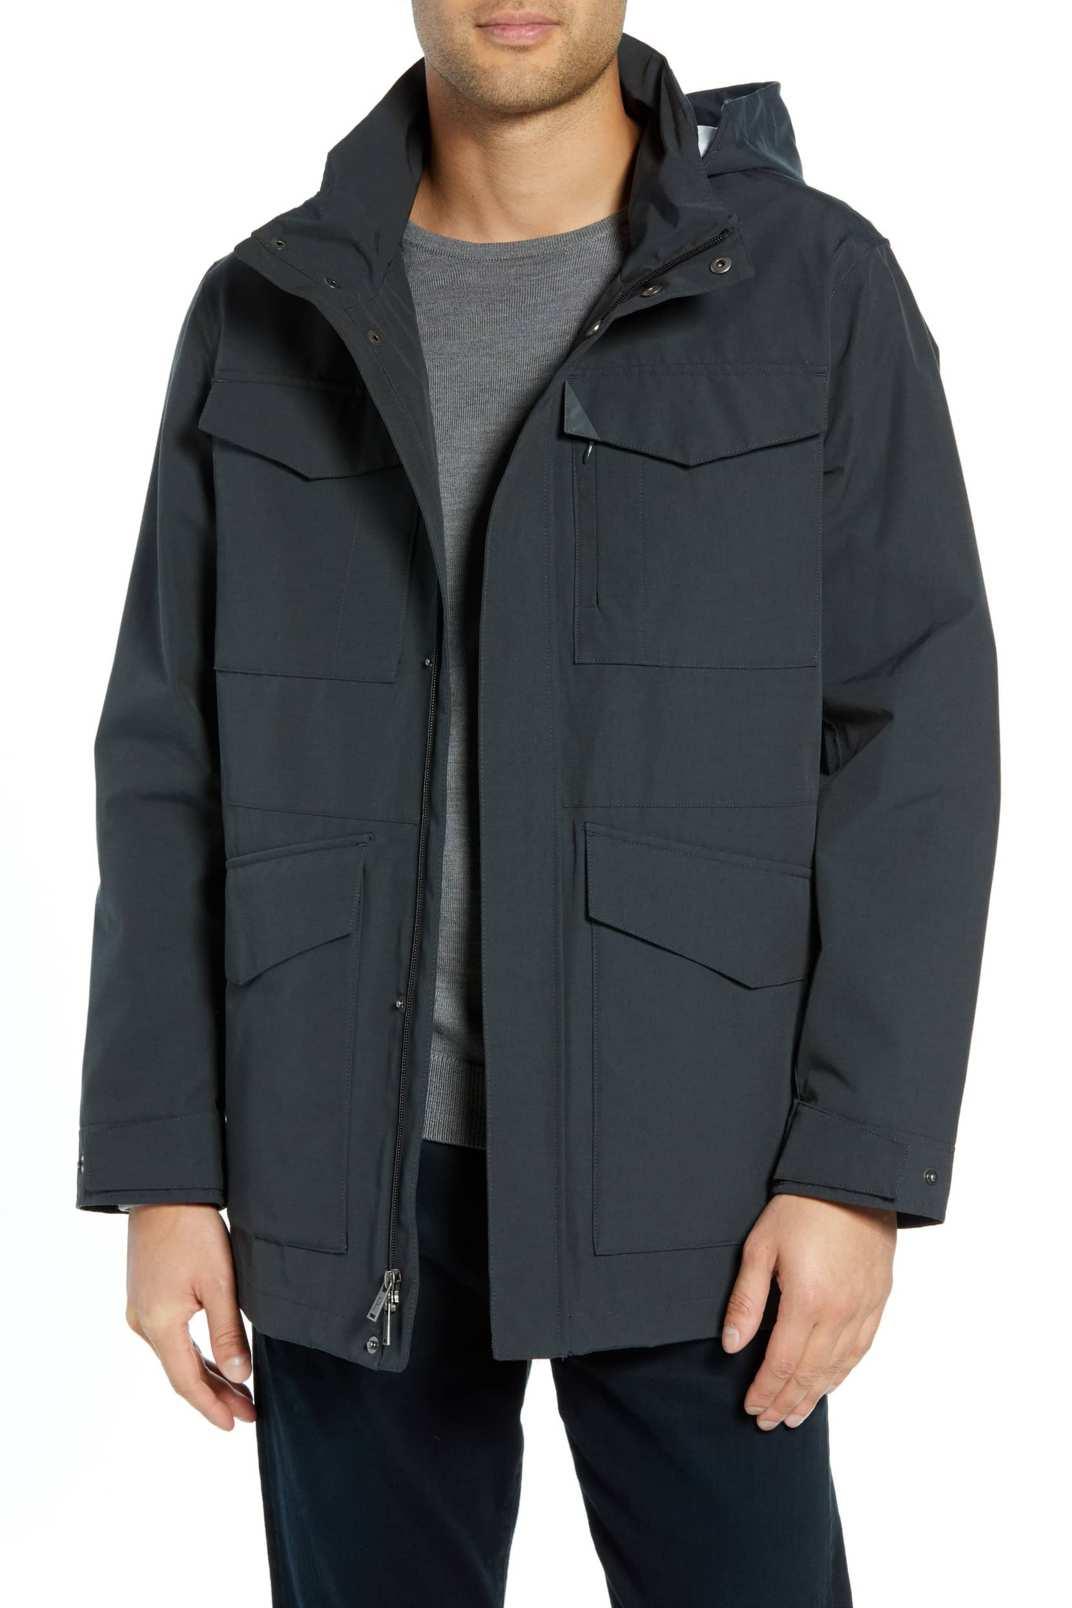 Pendleton Clyde Hill Commuter Coat